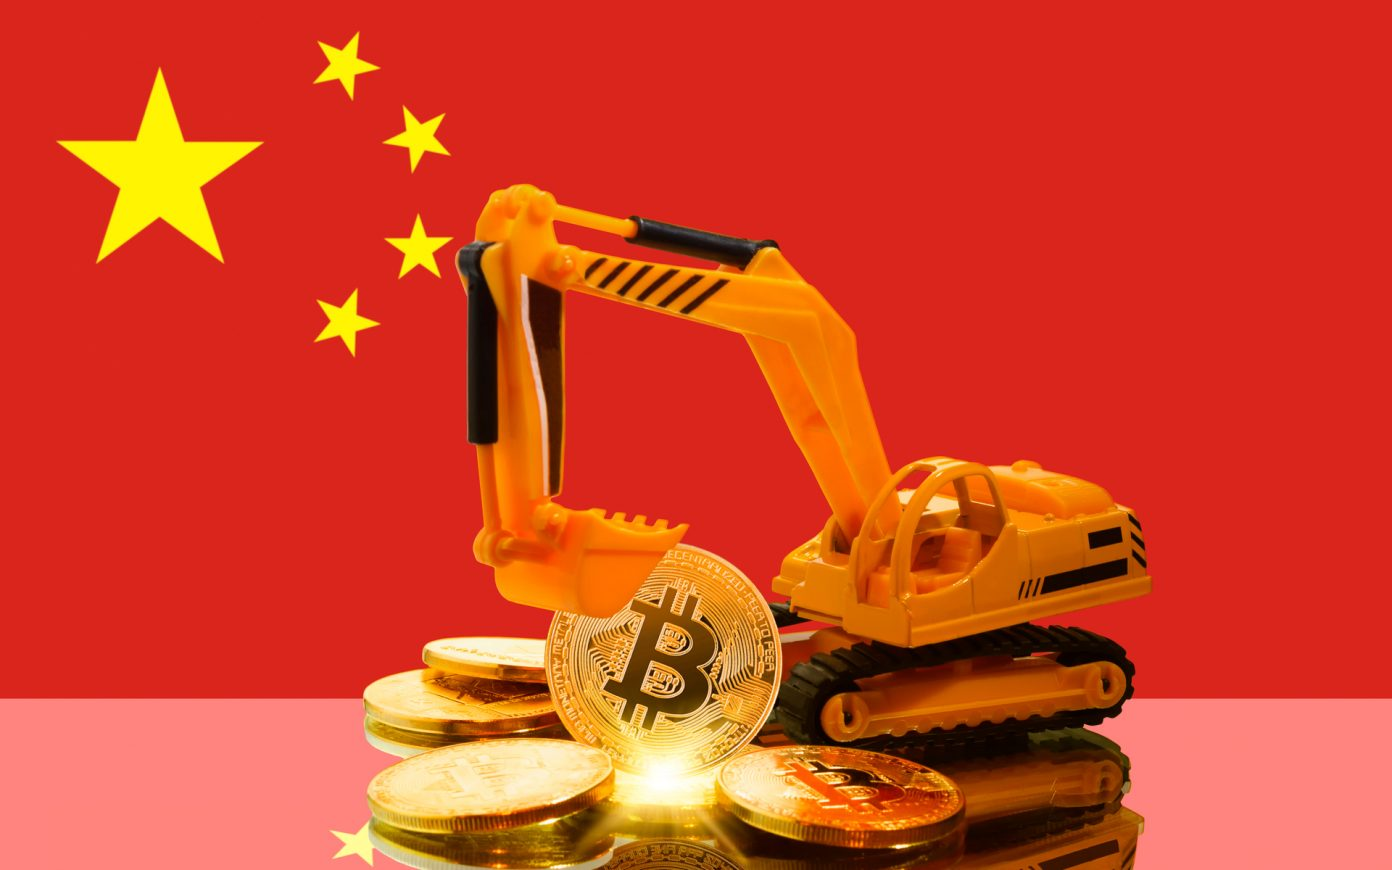 Bitcoin Mining Manufacturer Canaan Files for Hong Kong Stock Exchange IPO